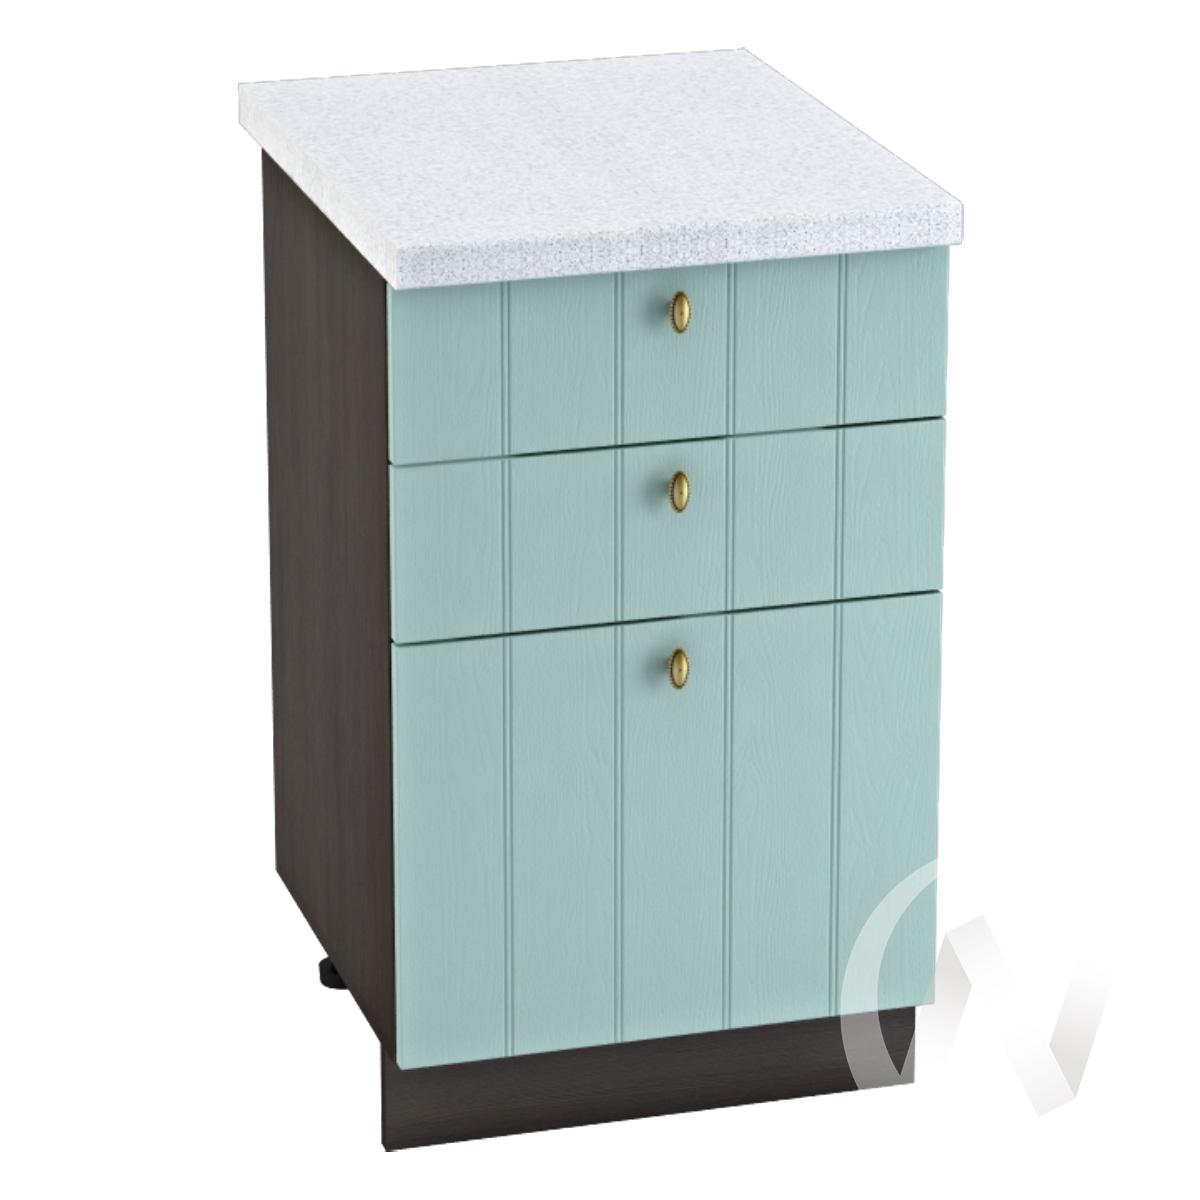 "Кухня ""Прованс"": Шкаф нижний с 3-мя ящиками 500, ШН3Я 500 (голубой/корпус венге)"